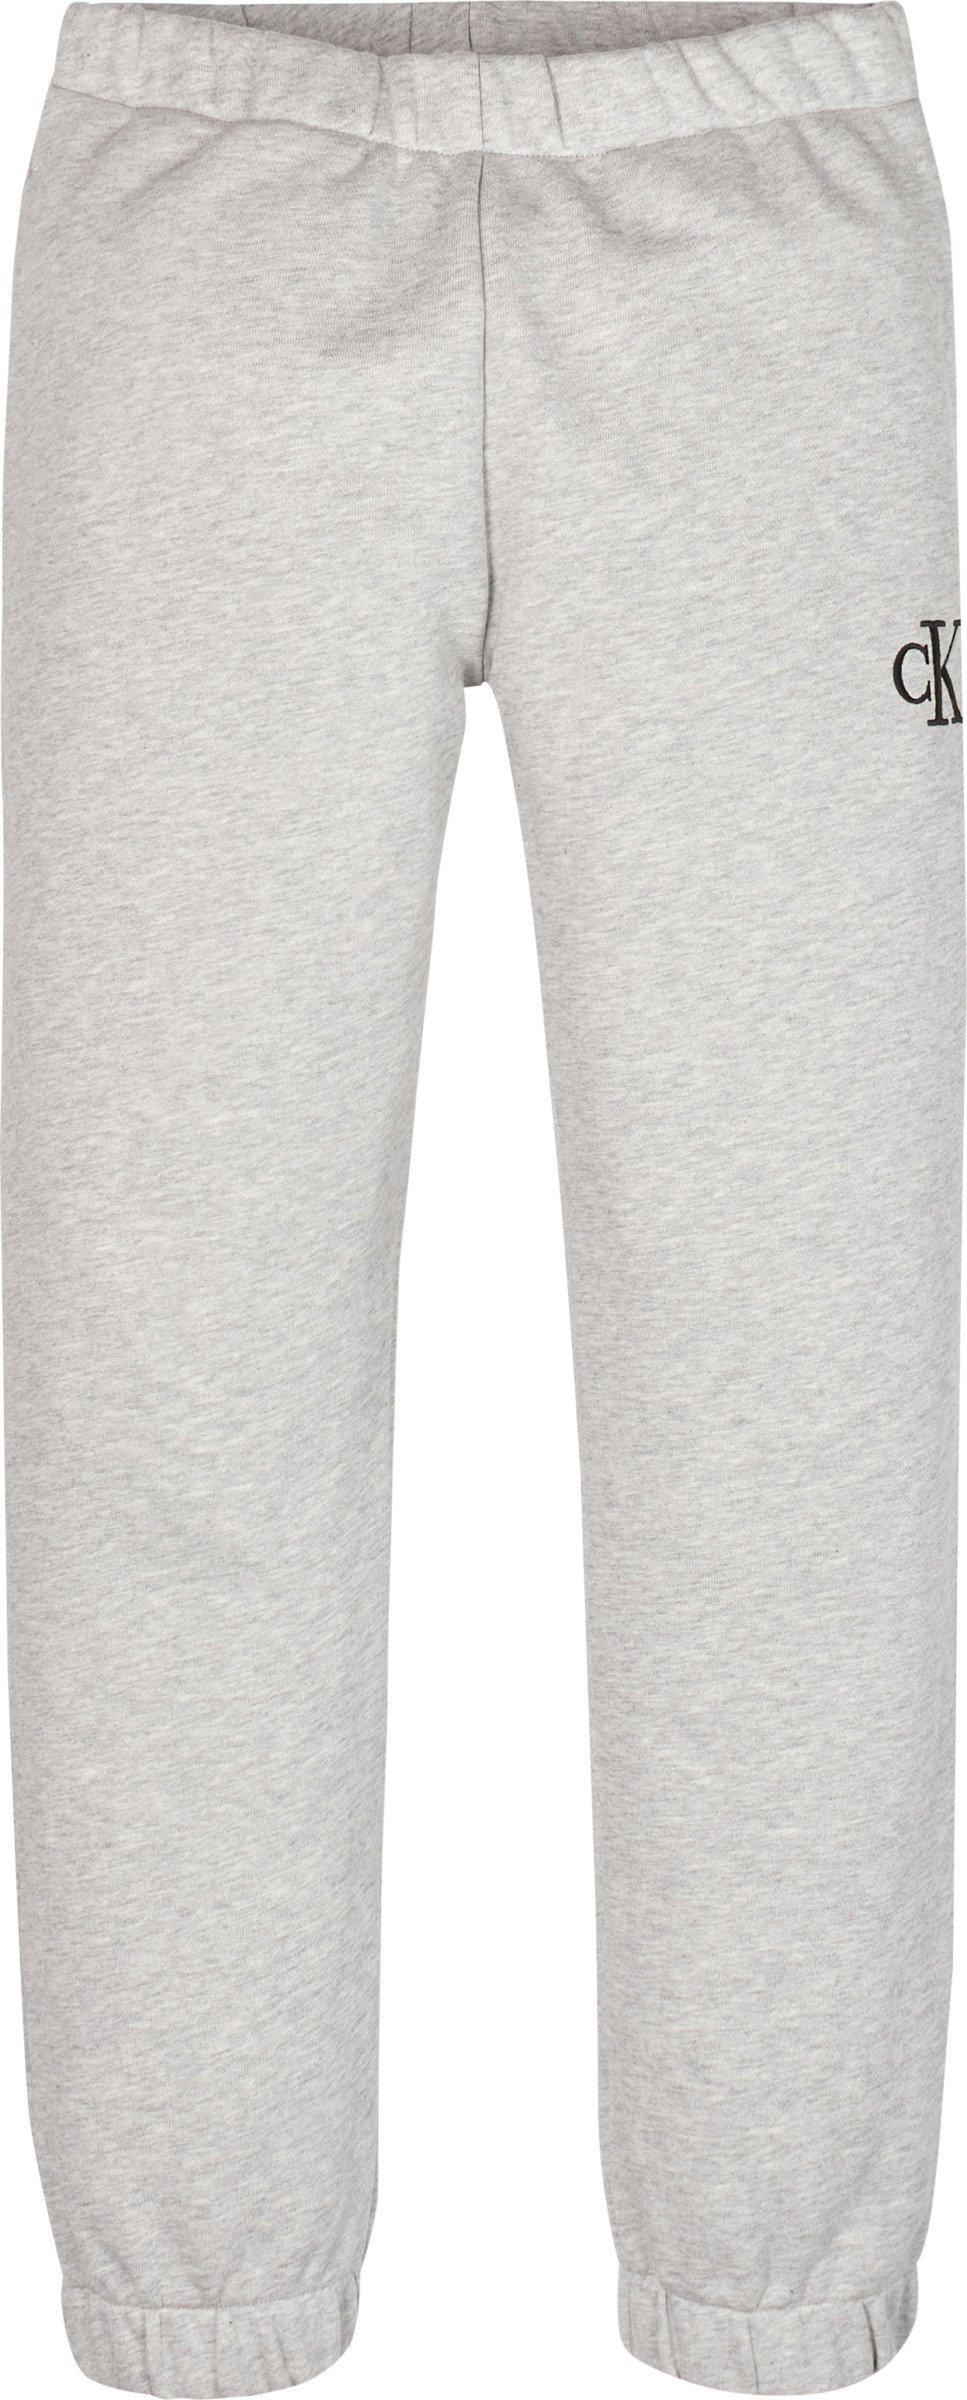 Calvin Klein, relaxed elastic collegehousut